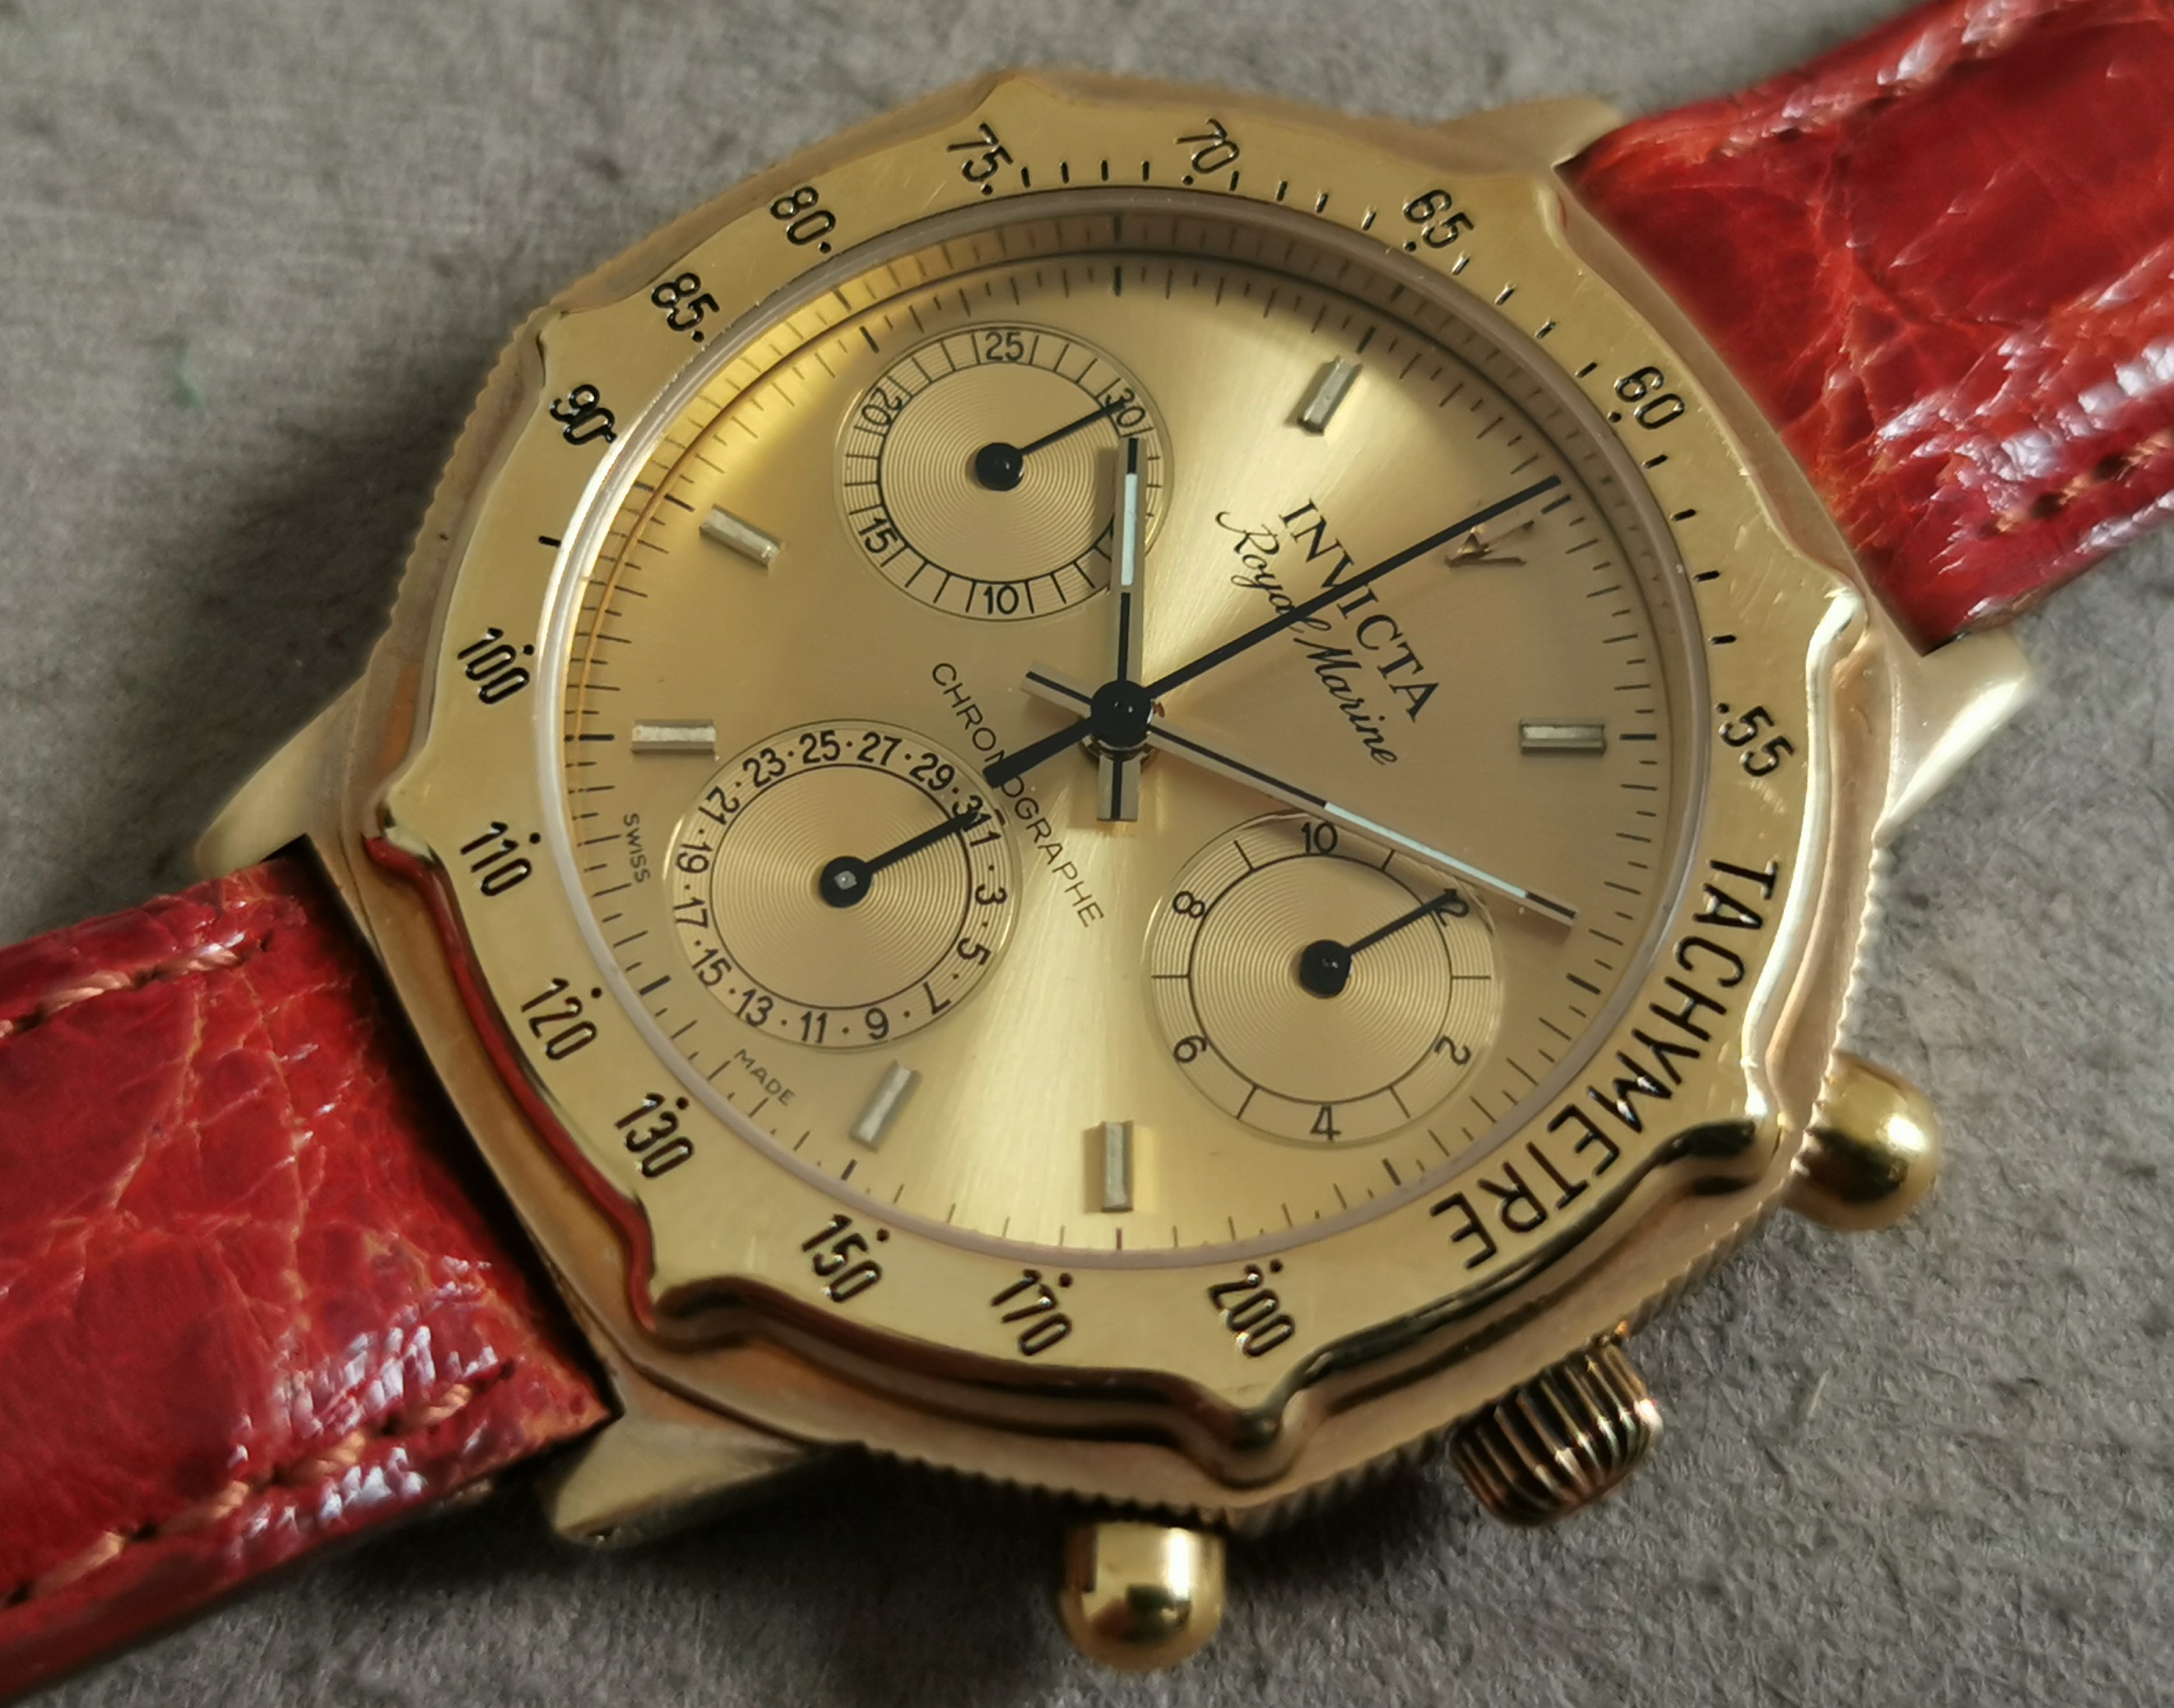 Invicta Royal Marine chrono ronda qz gold plated men's watch mm 36 newoldstock | San Giorgio a Cremano